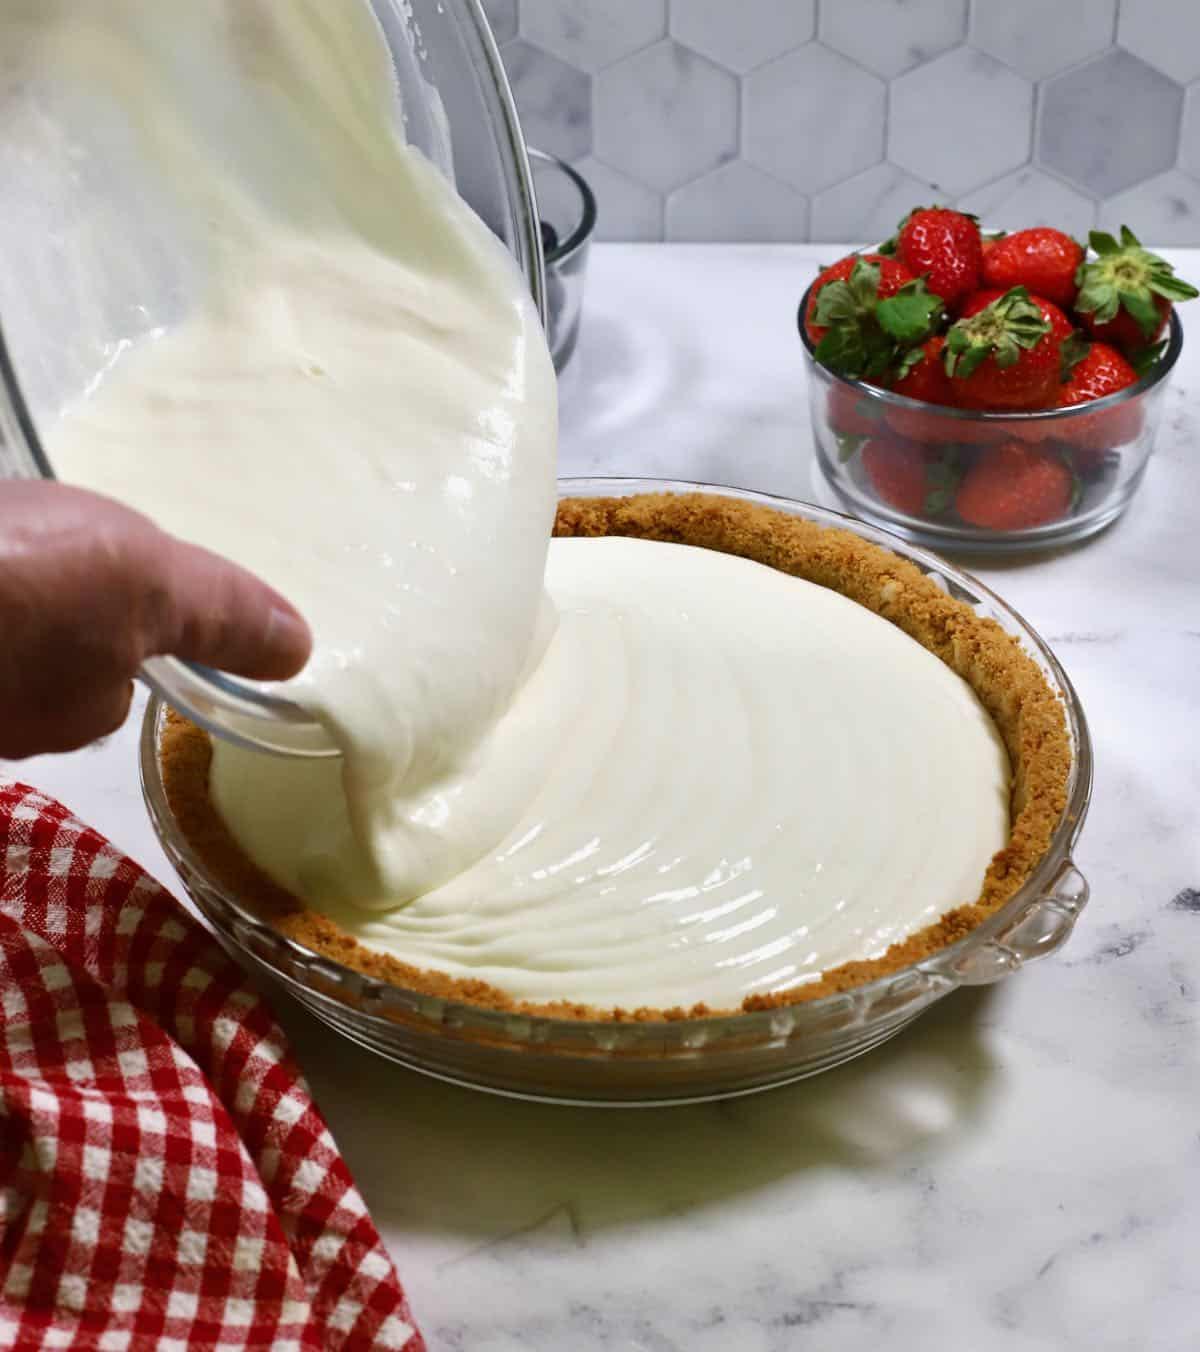 Pouring lemonade pie filling into a graham cracker crust.